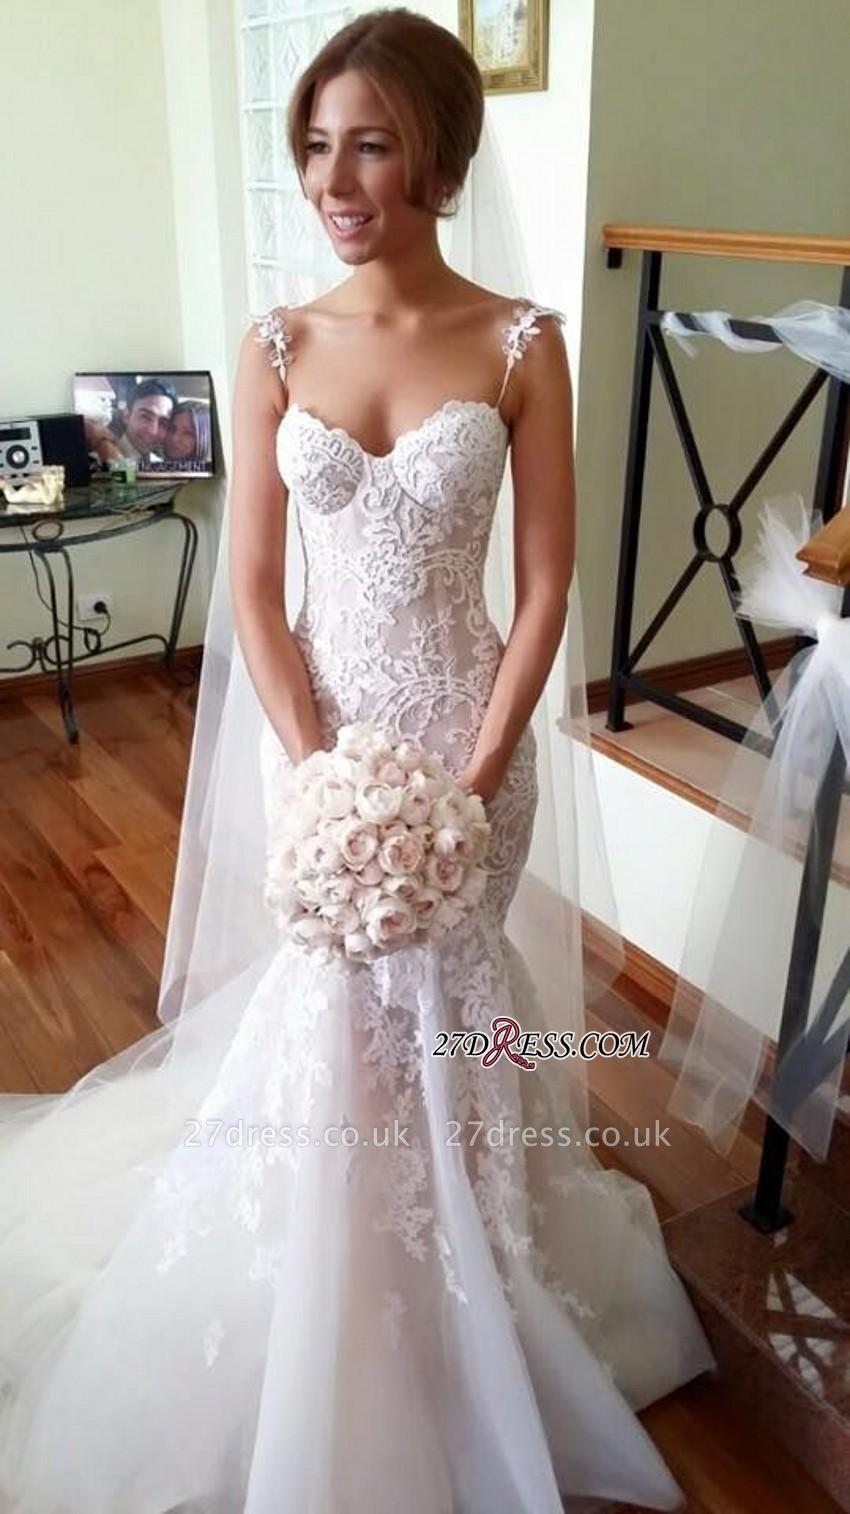 Tulle Spaghetti-Strap Sleeveless Applique Long Sexy Mermaid Wedding Dresses UK